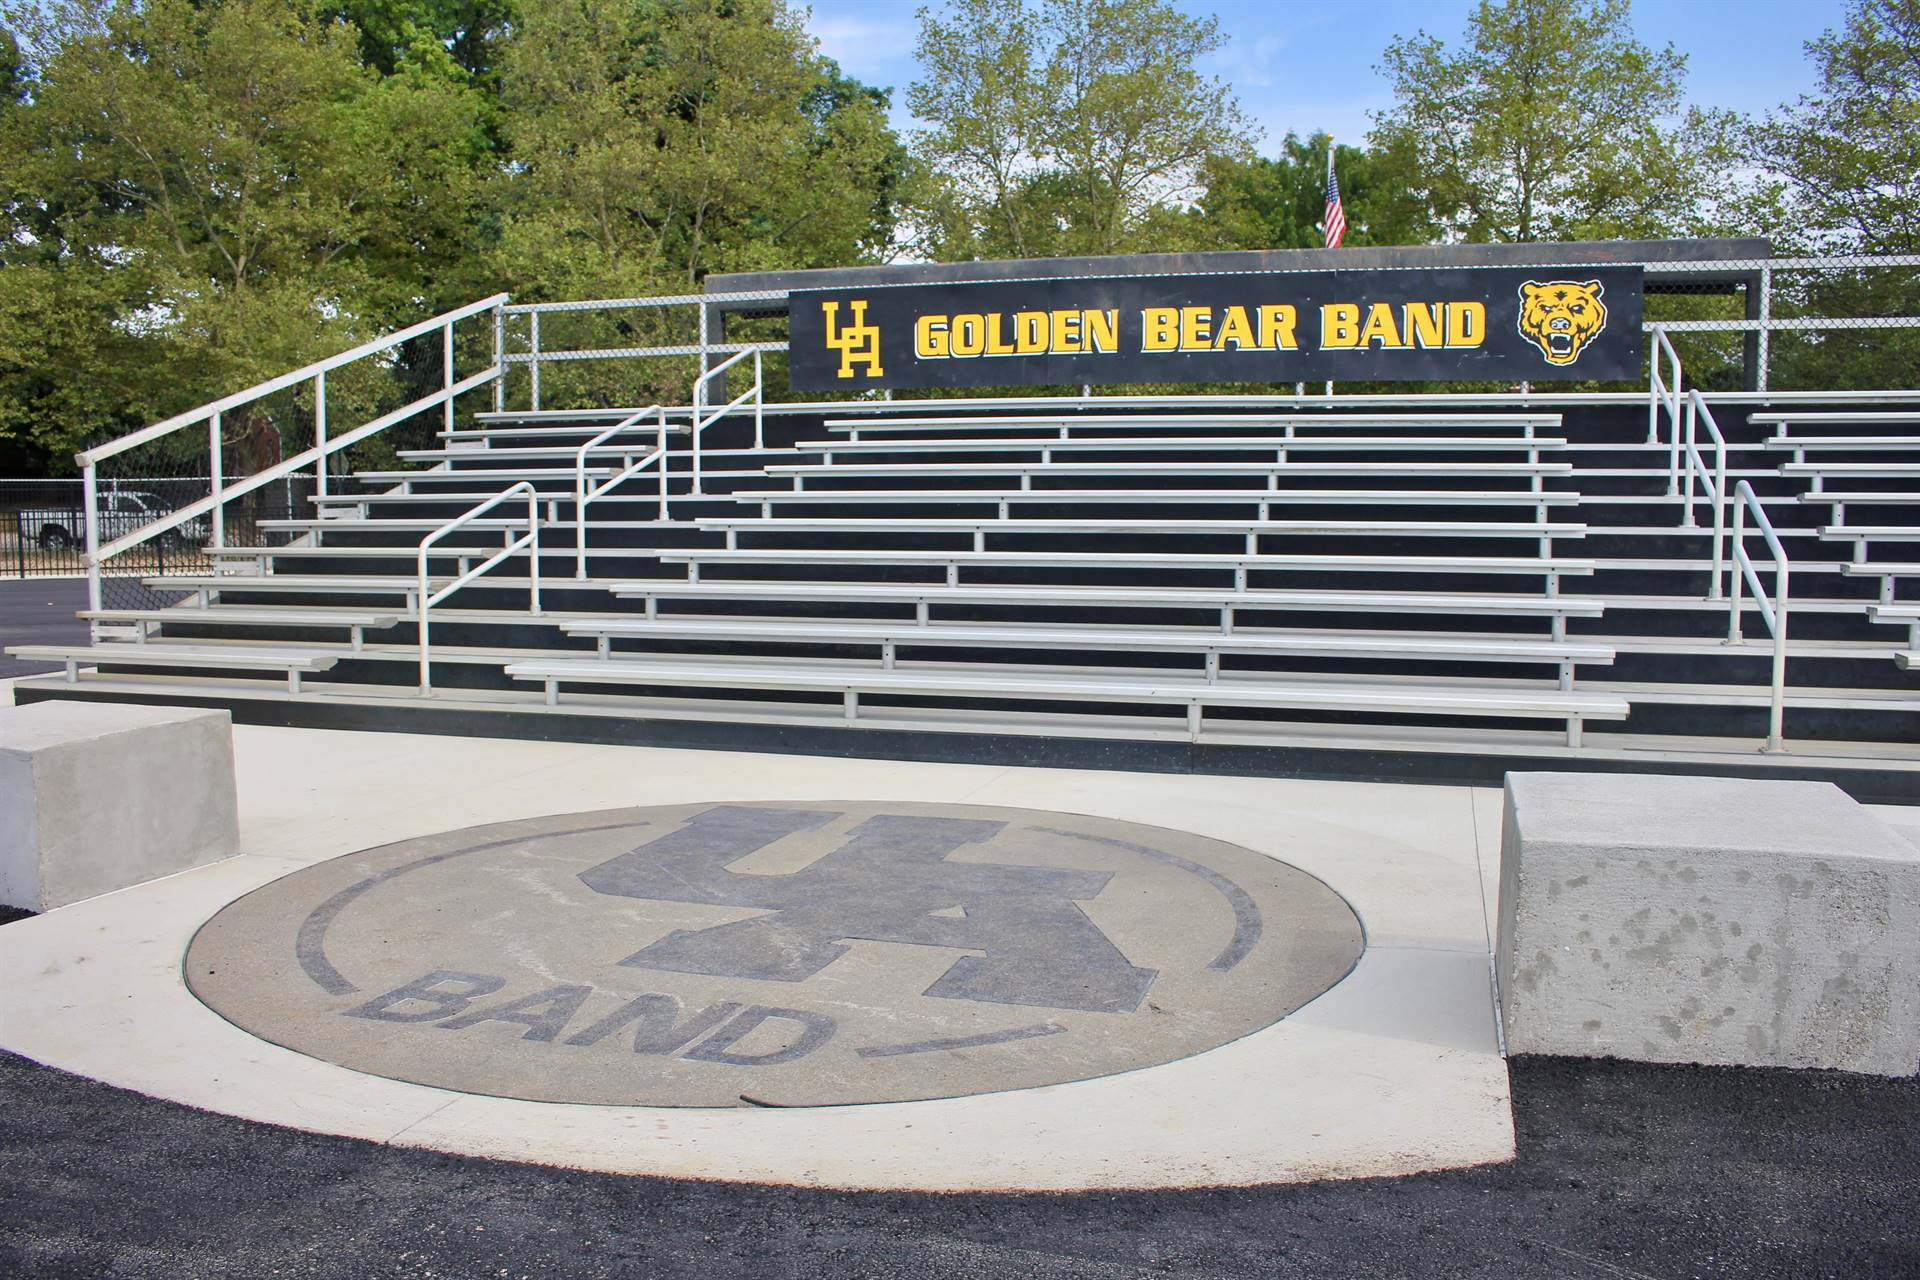 New bandstand and emblem